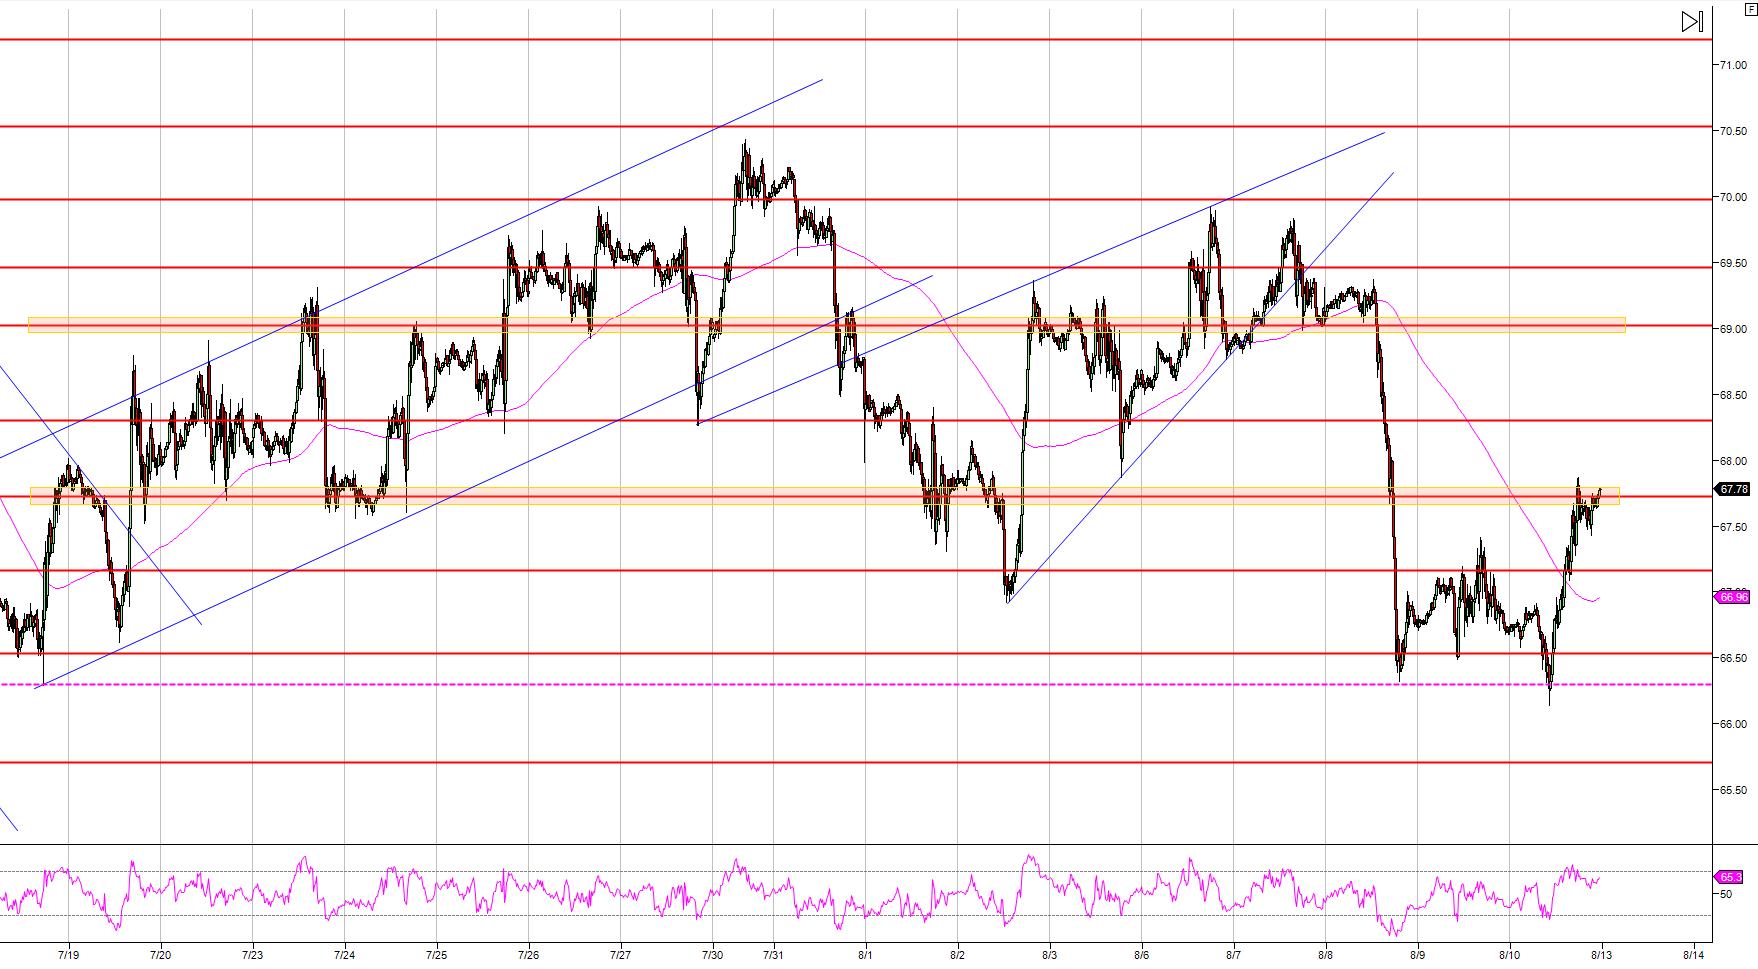 Crude Oil WTI Technical Analysis: Bulls retake control